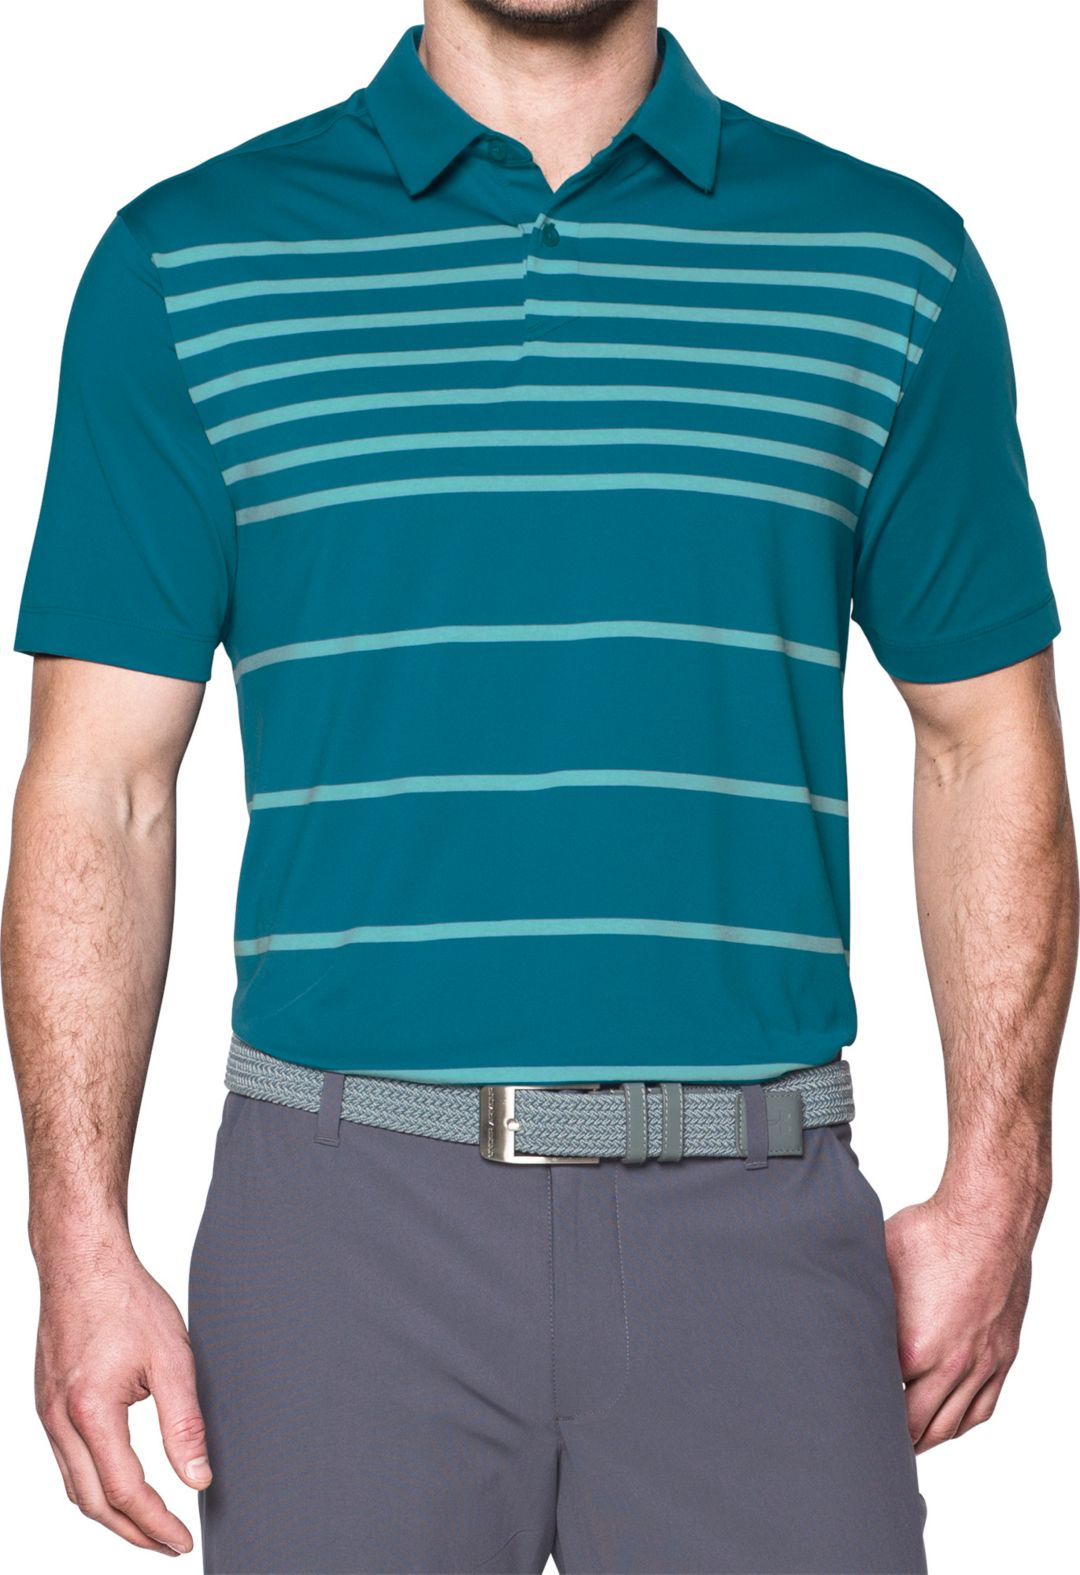 605f6d38 Under Armour Men's CoolSwitch Brassie Stripe Golf Polo. noImageFound.  Previous